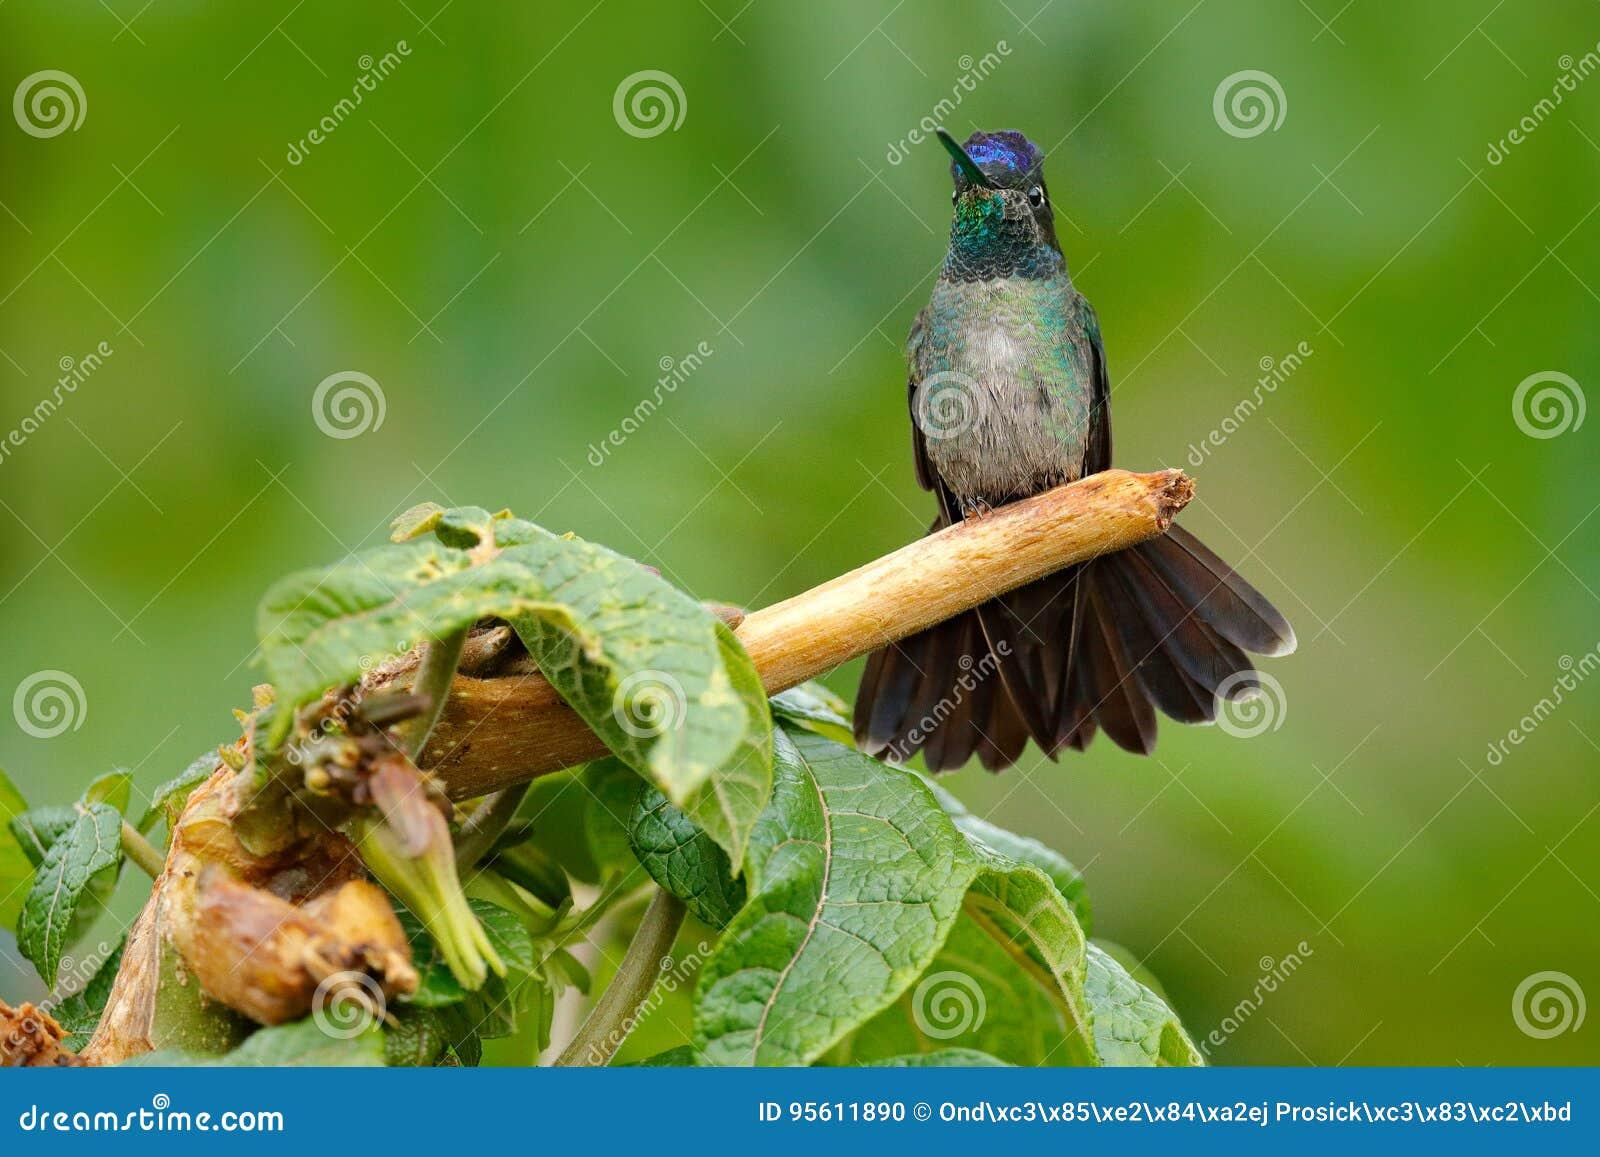 Prachtige Kolibrie, Eugenes fulgens, aardige vogel op mostak Het wildscène van aard Wildernisbomen met klein dier HU